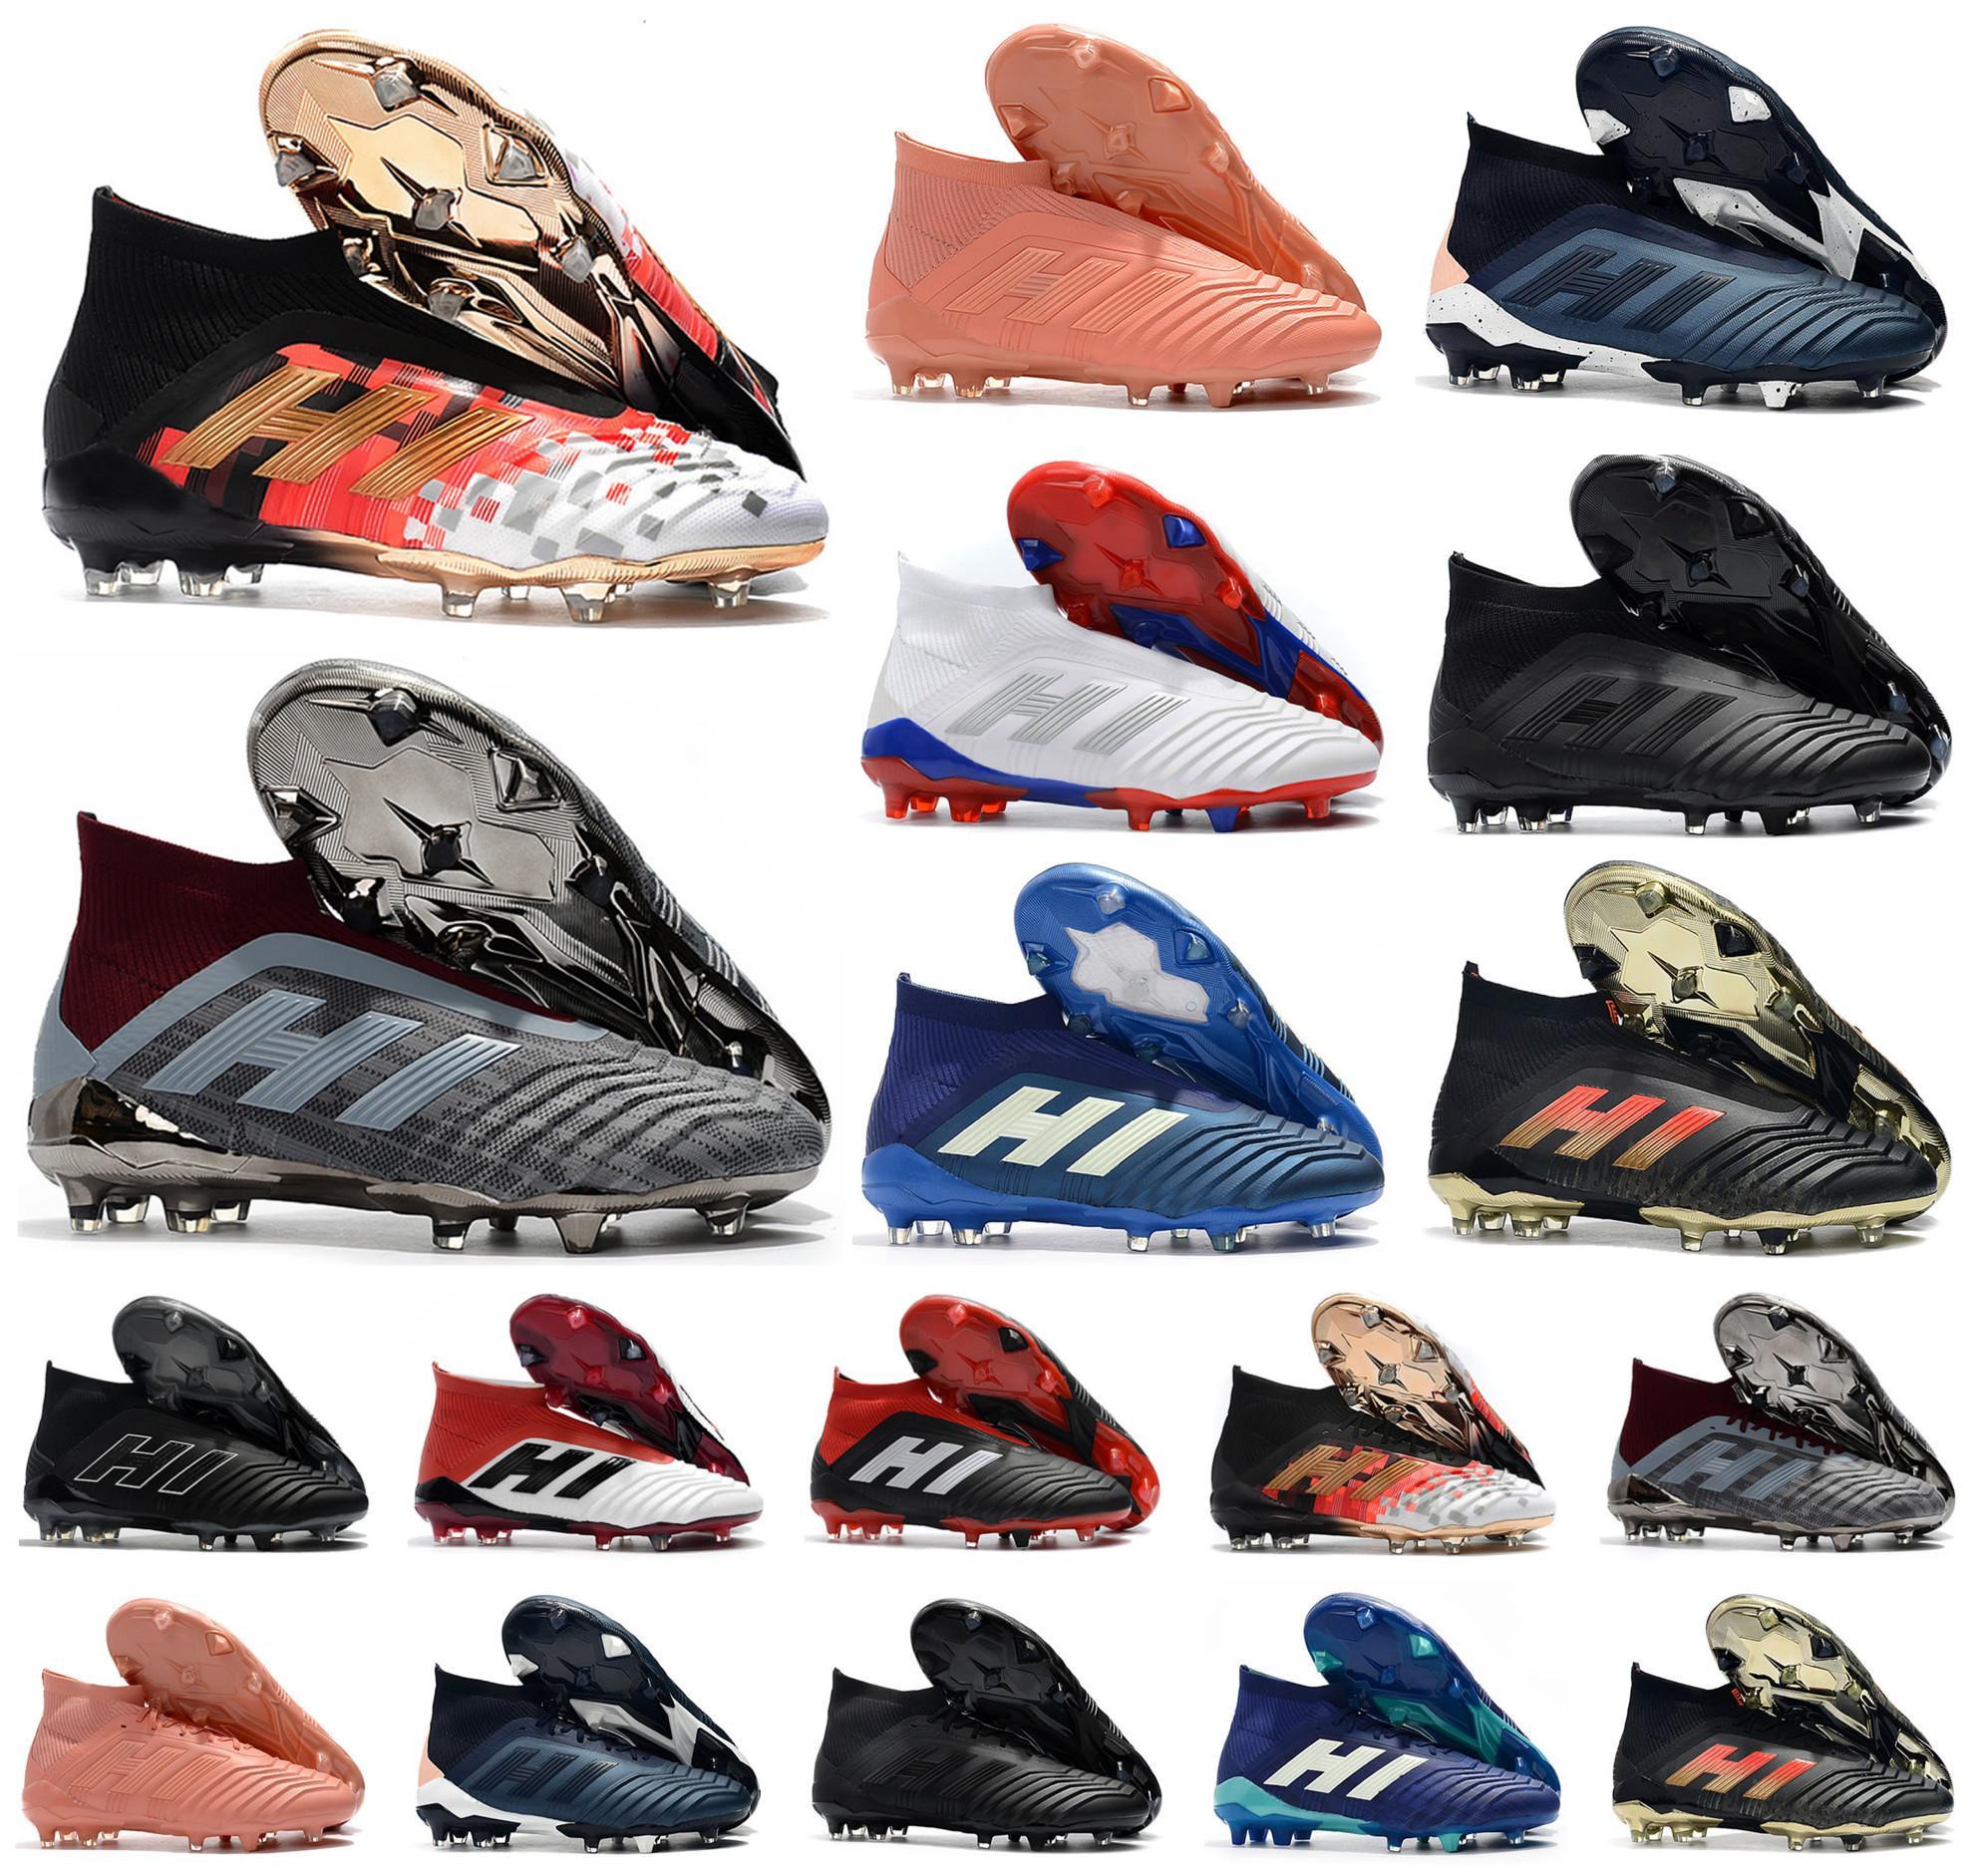 Hot Predator 18+ 18,1 FG Telstar PP Paul Pogba Fußball 18 + x Klampen Slip-On Fußballschuhe der Männer hohe Spitzenfußballschuhe Größe 39-45